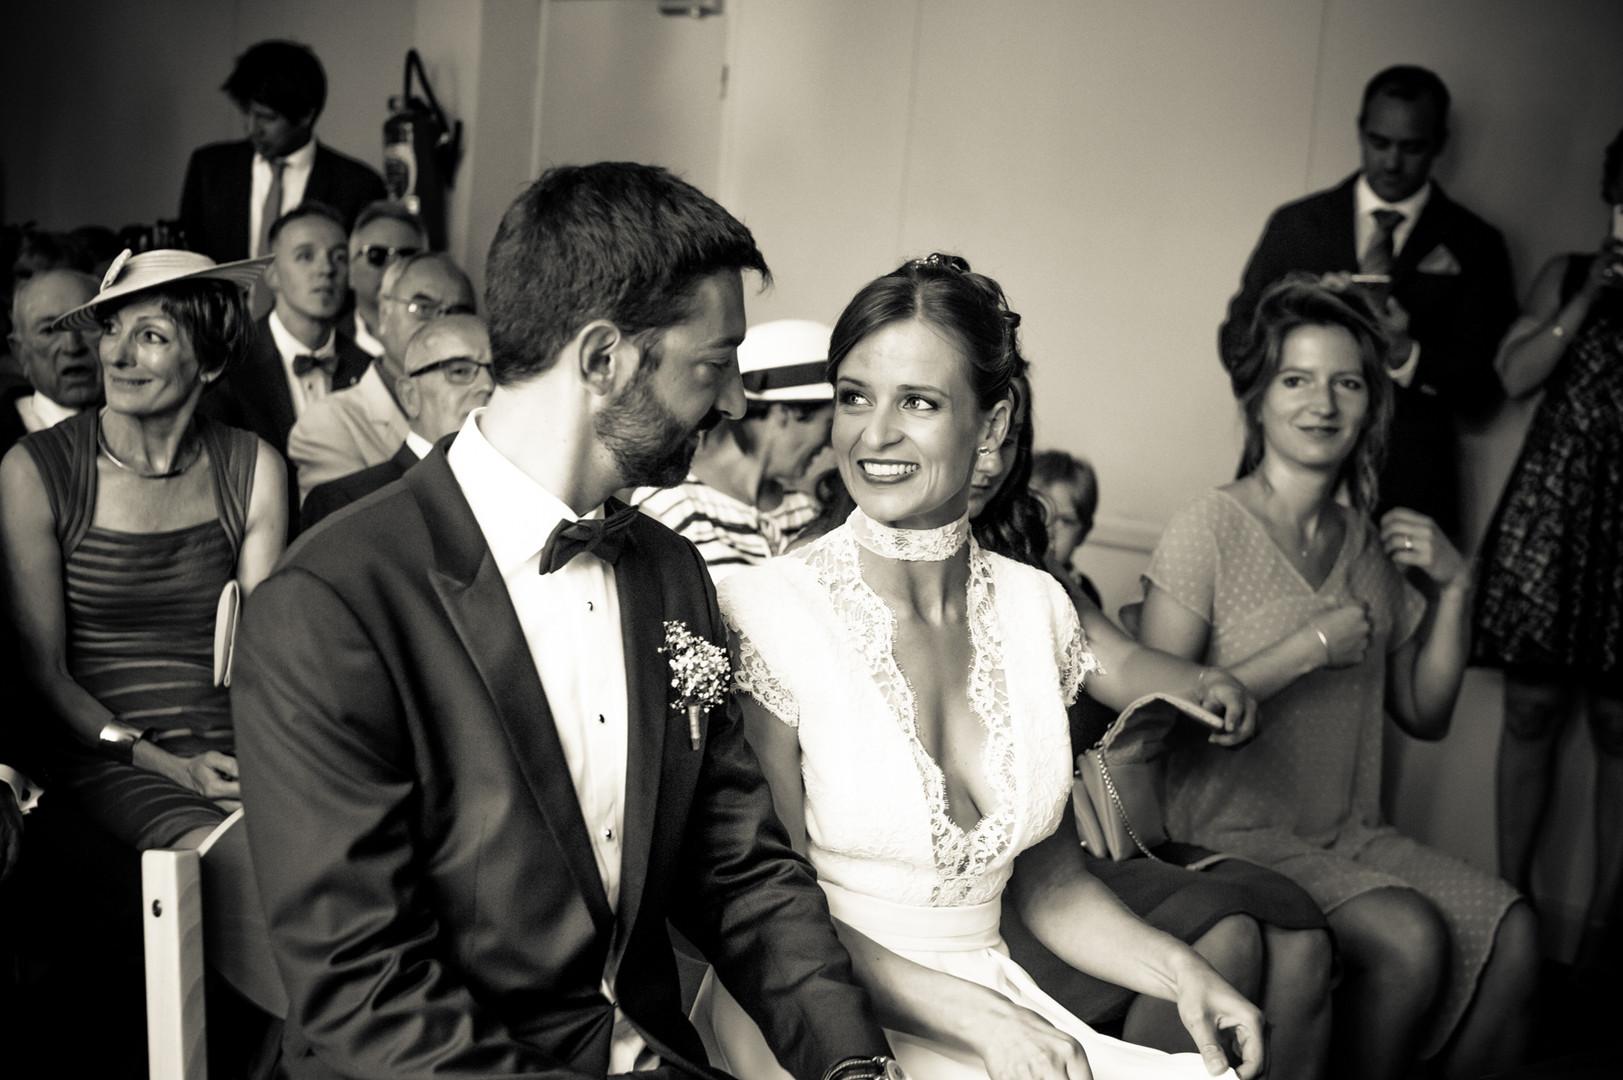 mariage-candice&victor-60.jpg